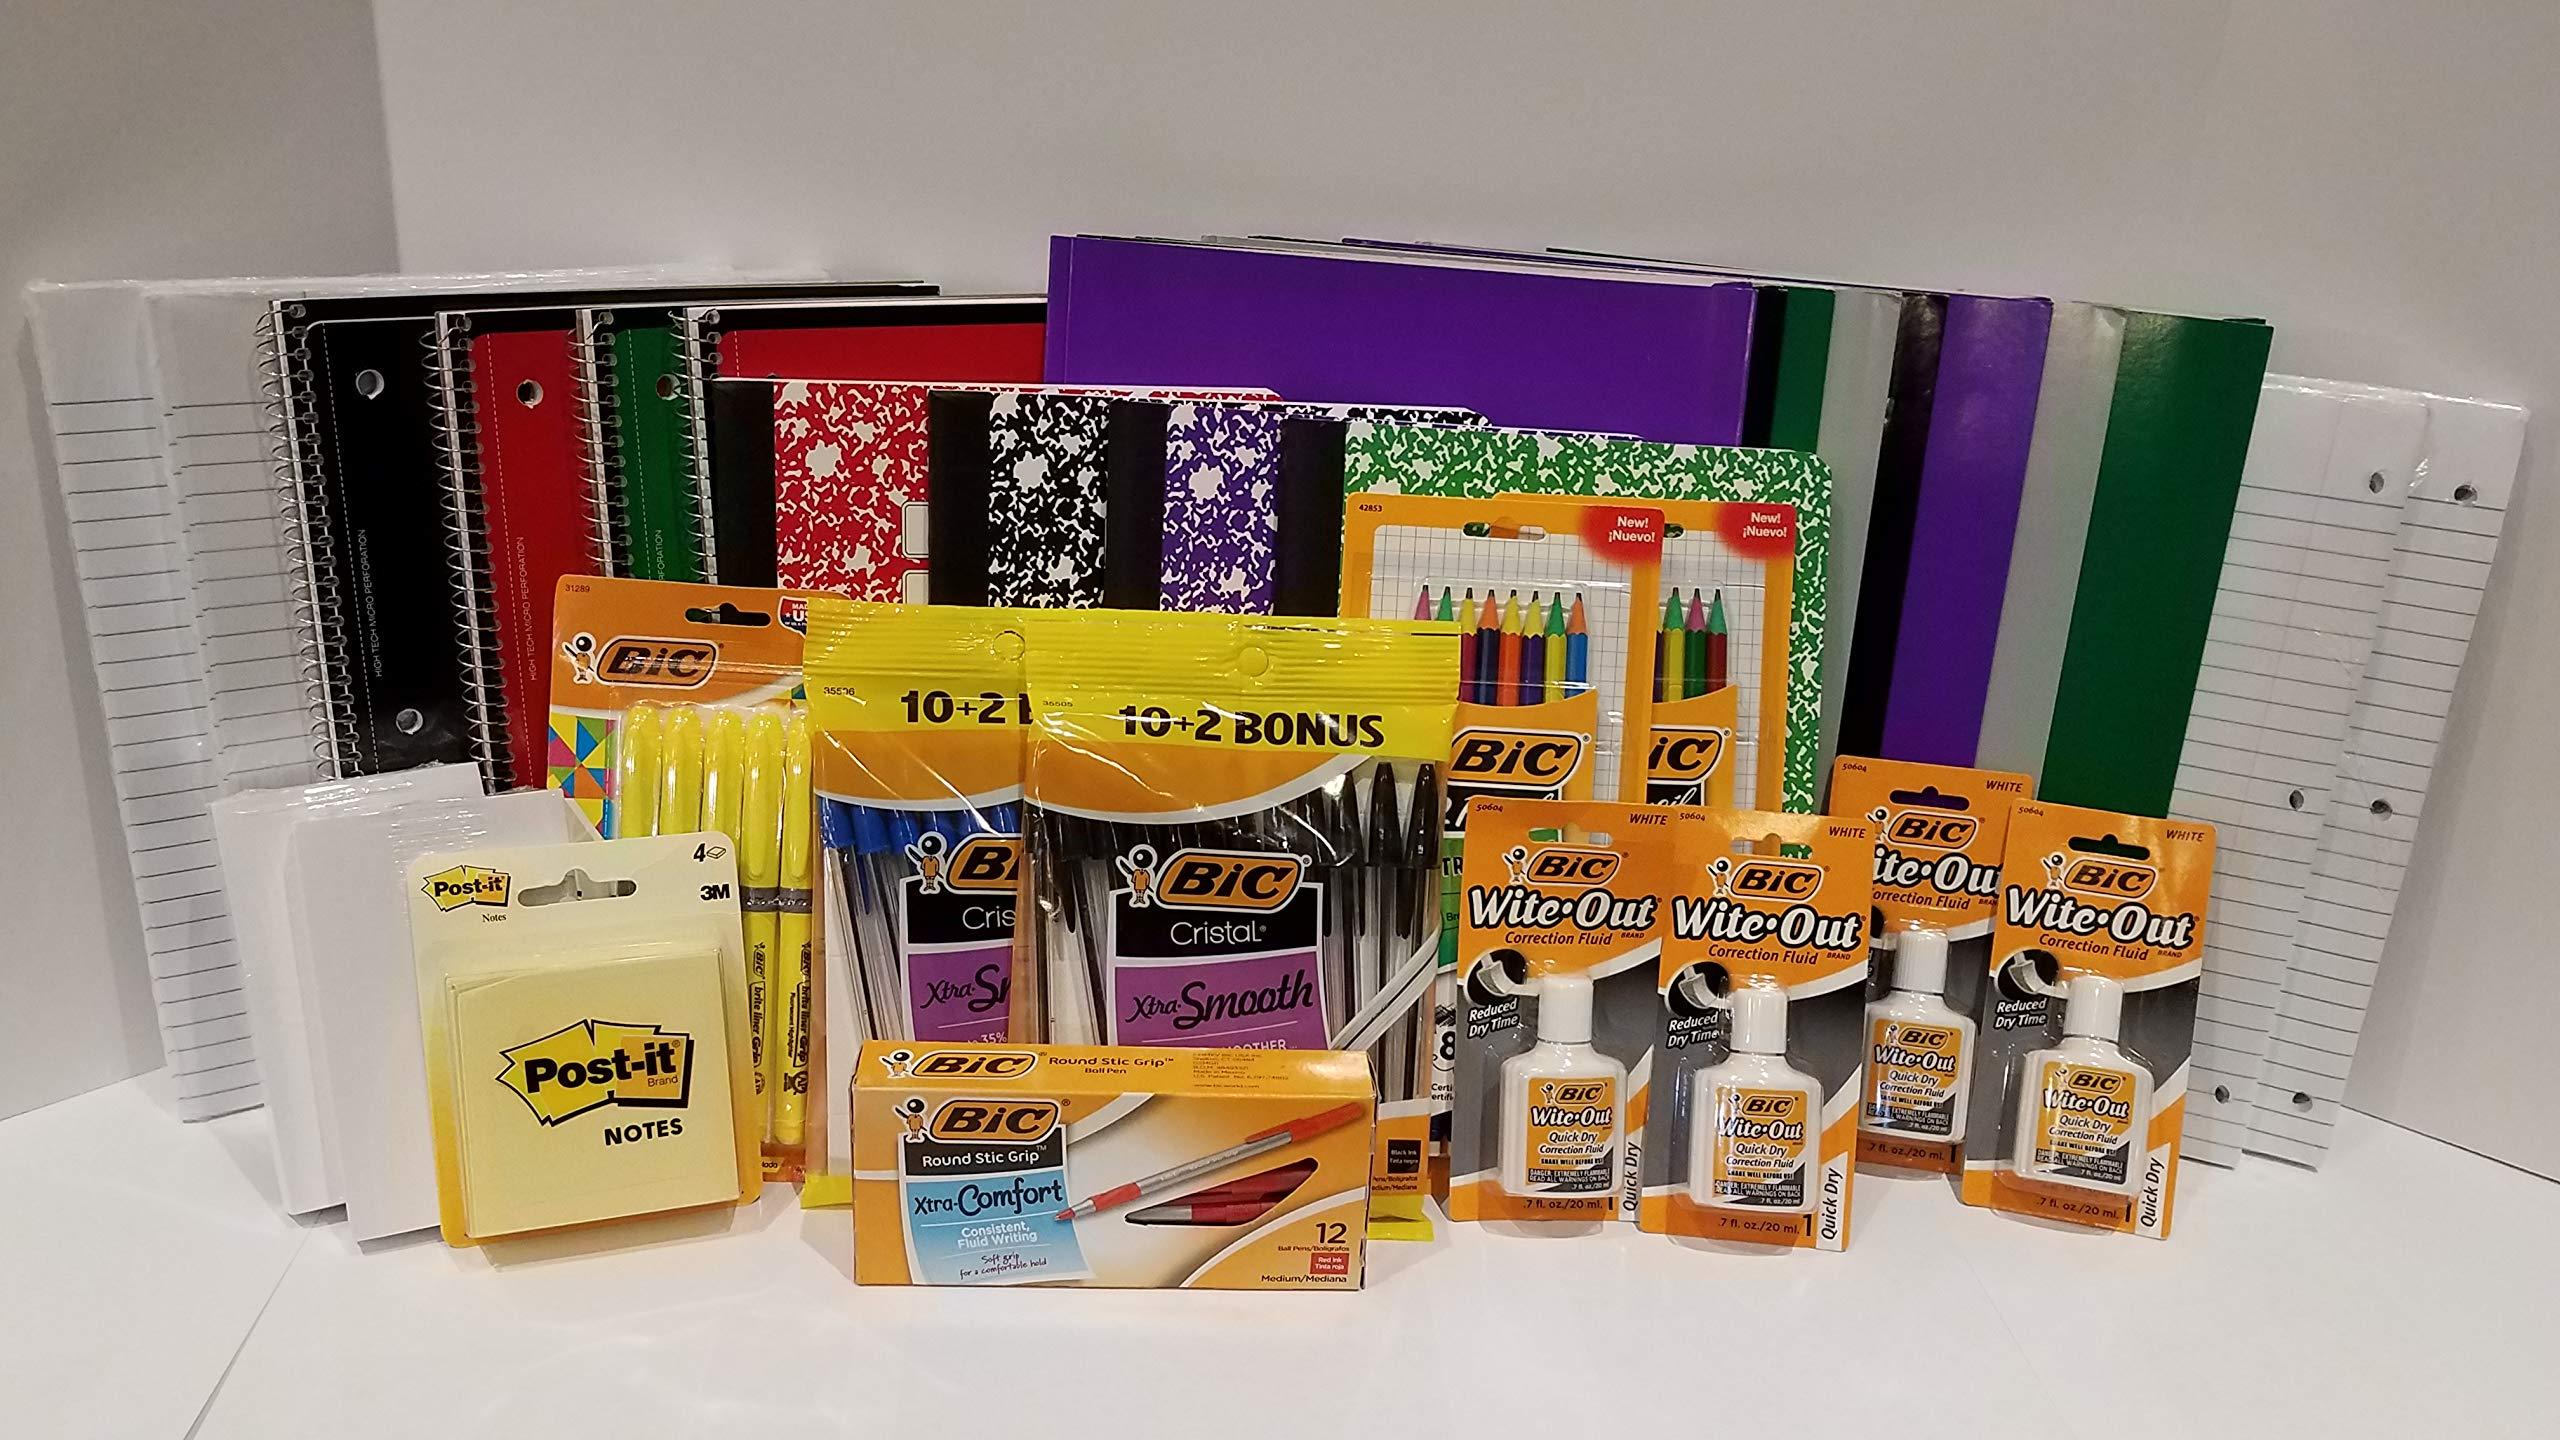 School Supplies Bundle: 33 School Essentials for All Grades - Wide Ruled Paper, Pens, Pencils, Notebooks & More